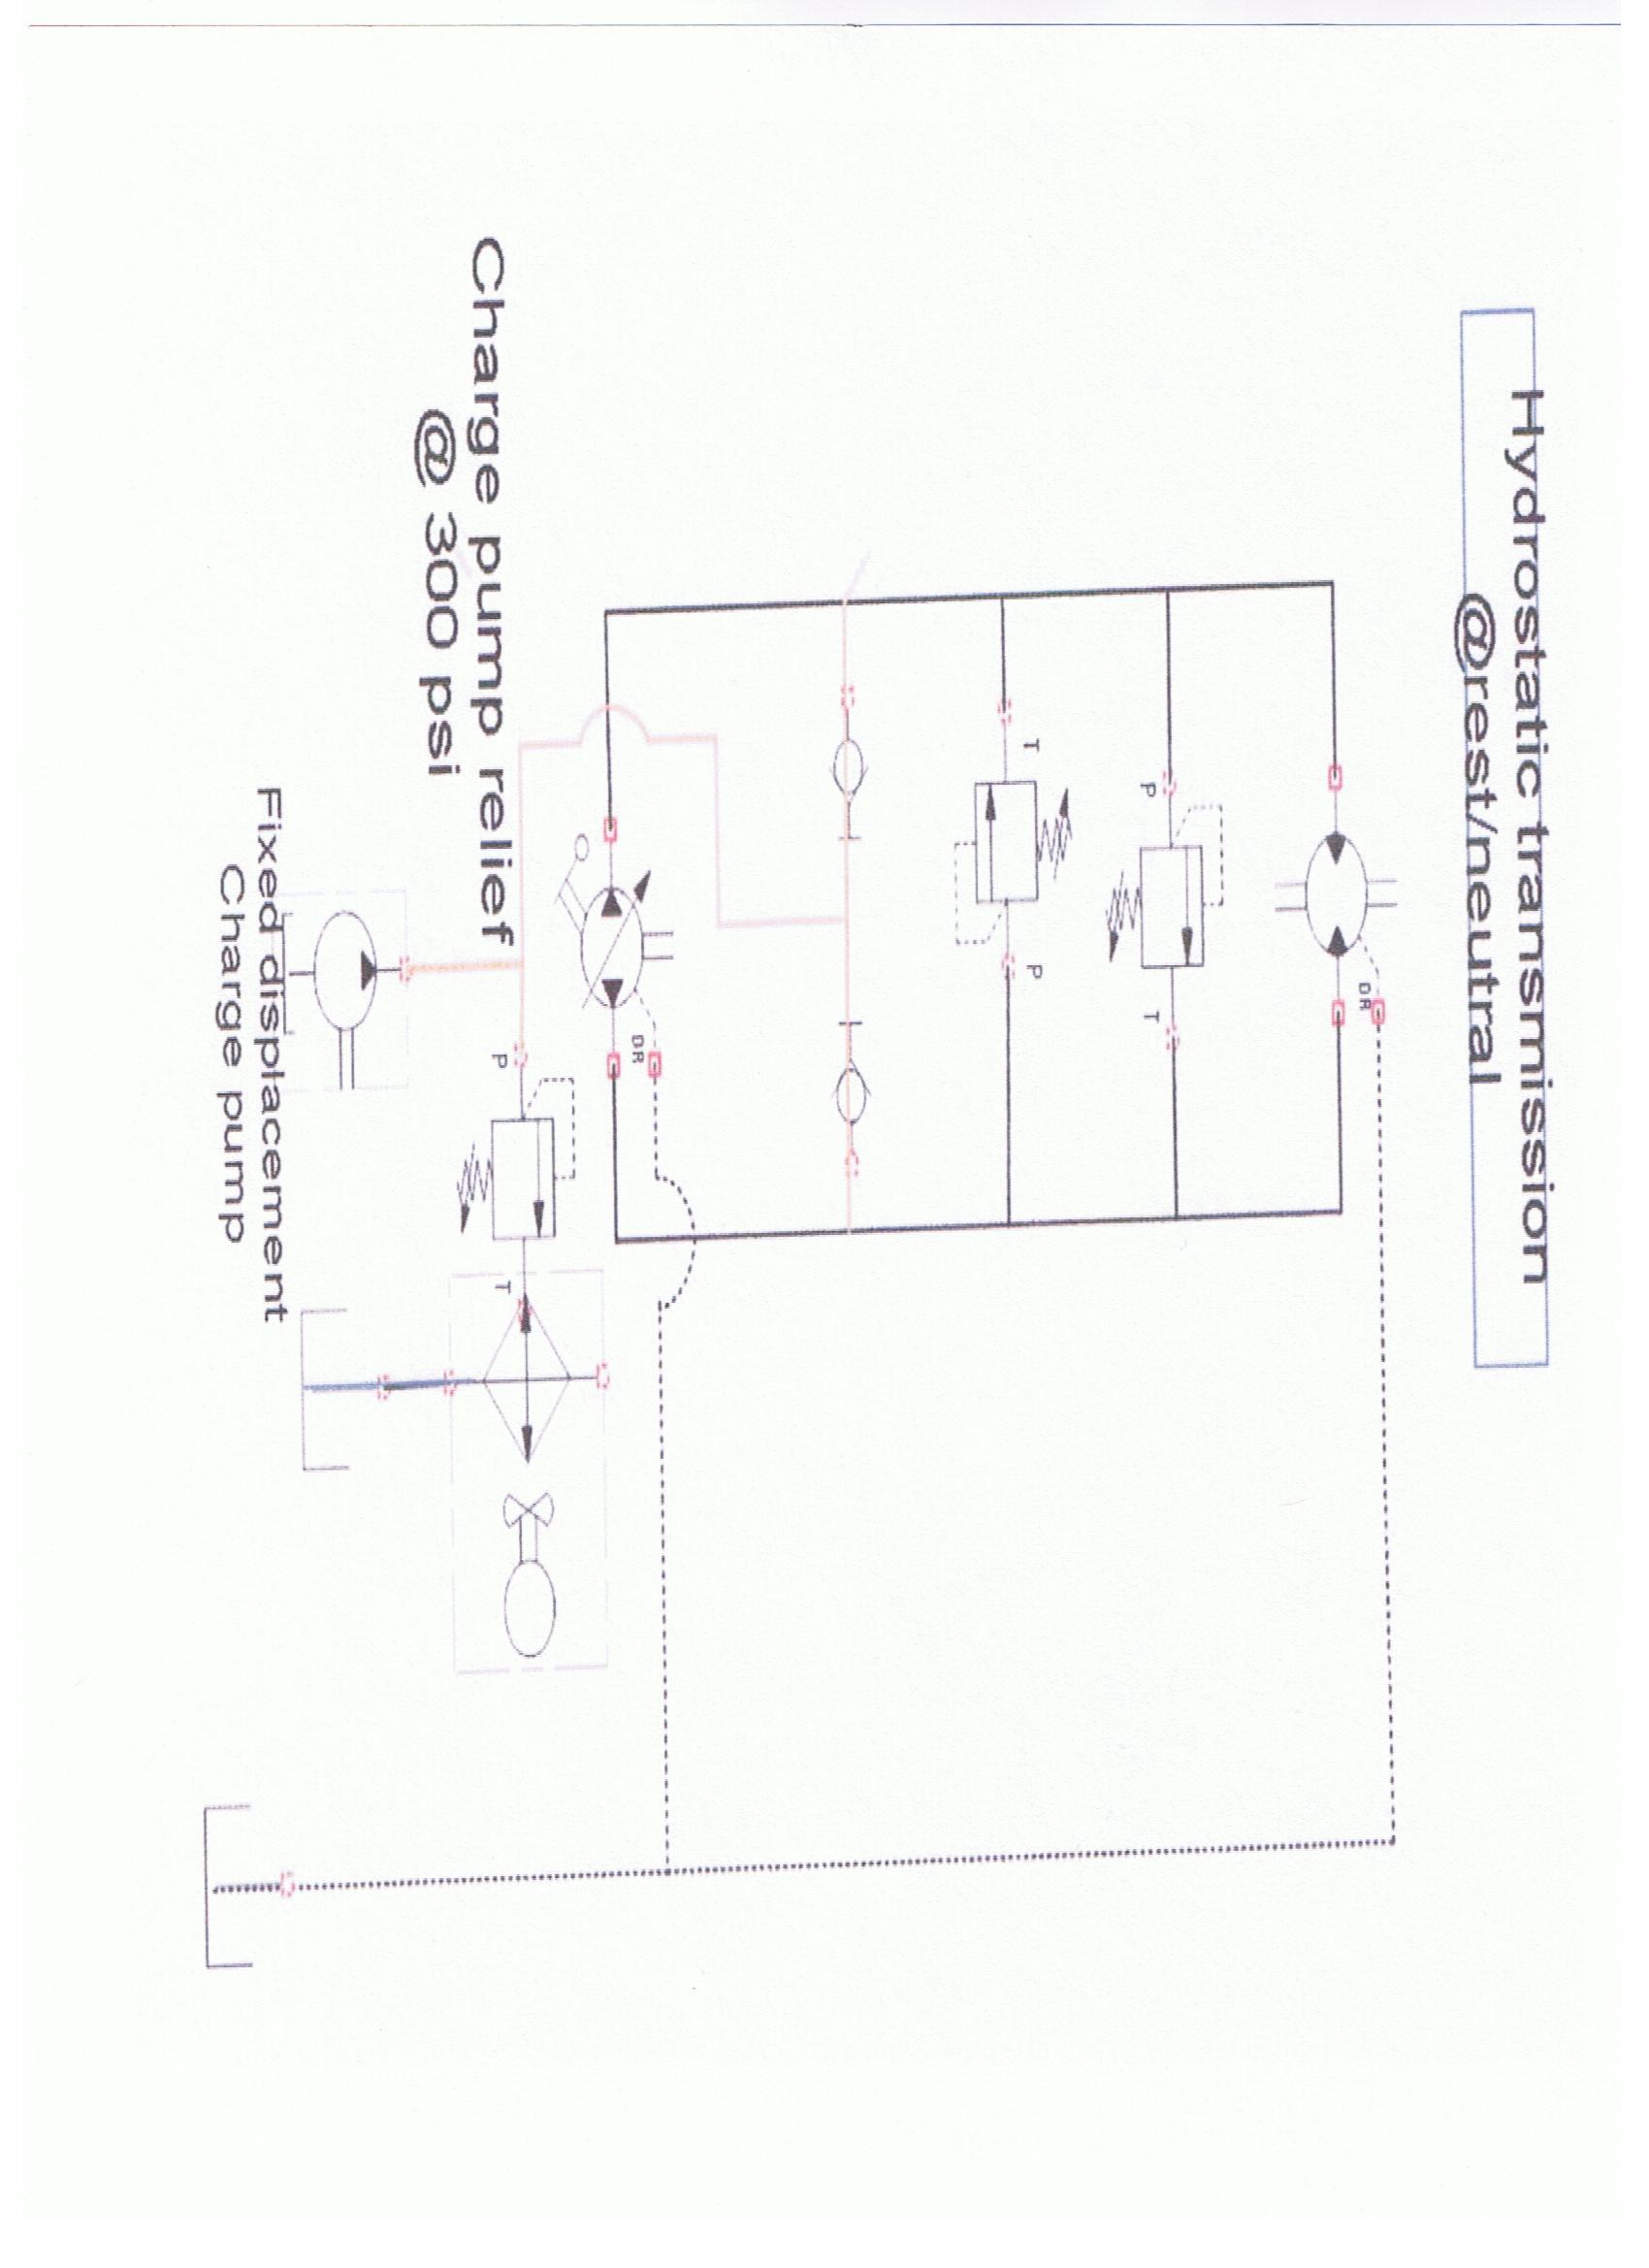 Hydrostatic Transmission Schematic